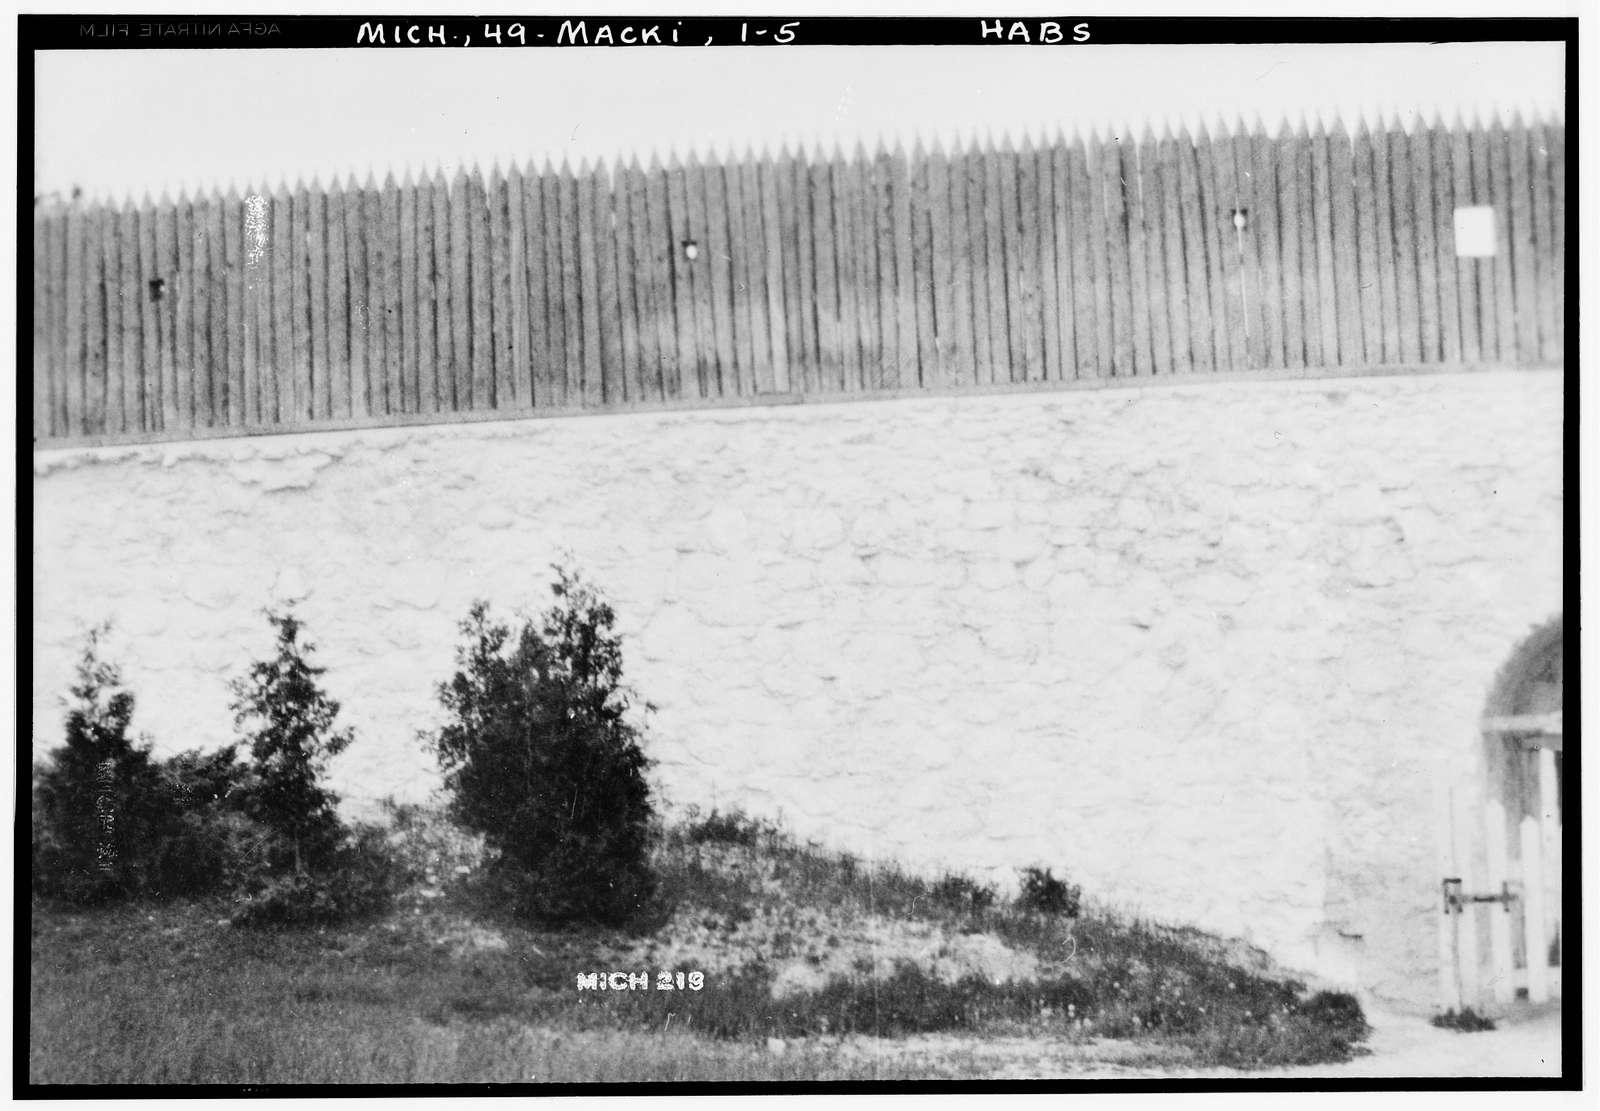 Fort Mackinac, Mackinac Island, Mackinac County, MI